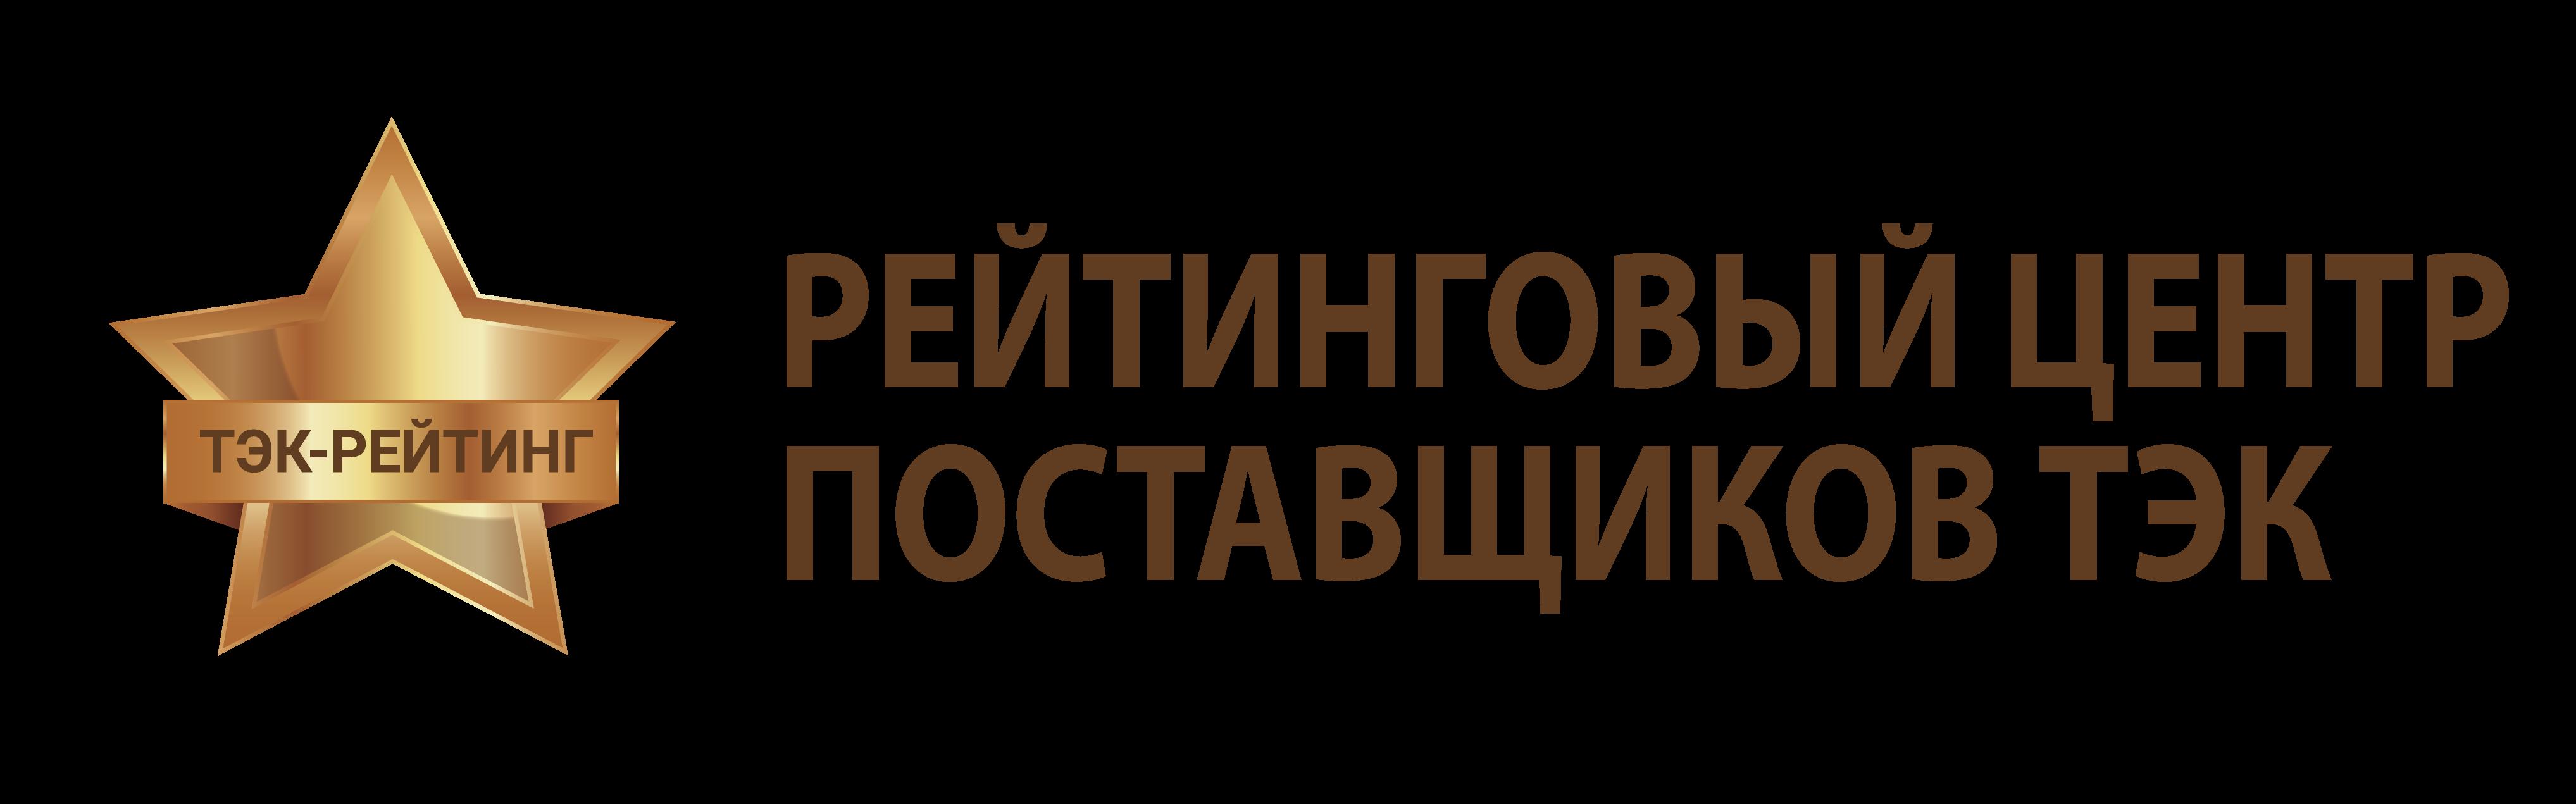 https://www.n-g-k.ru/picsss/2019/tekr2019.png